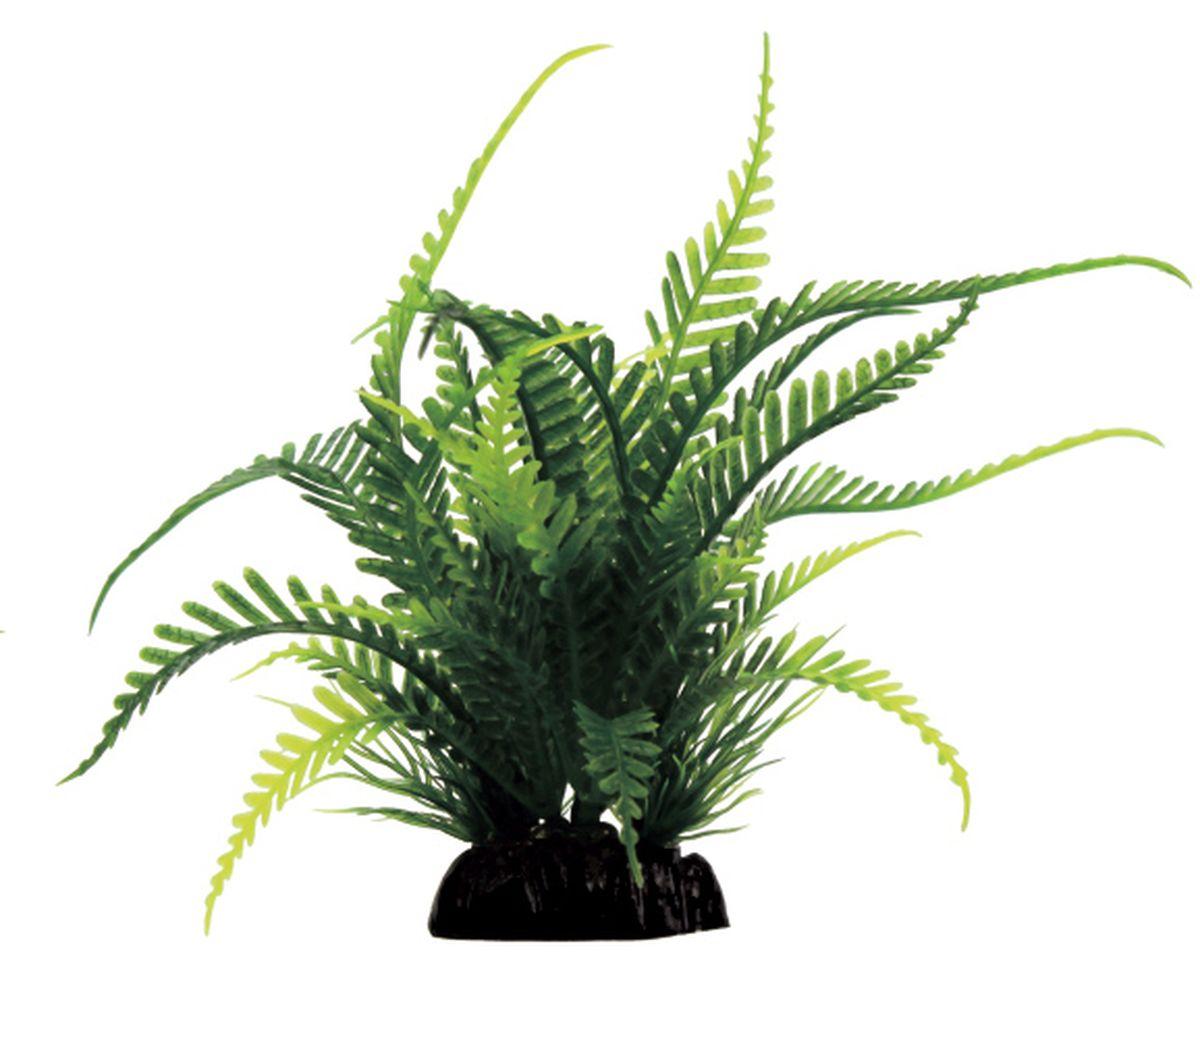 Растение для аквариума ArtUniq Папоротник, 15 x 8 x 15 смART-1130903Растение для аквариума ArtUniq Папоротник, 15 x 8 x 15 см